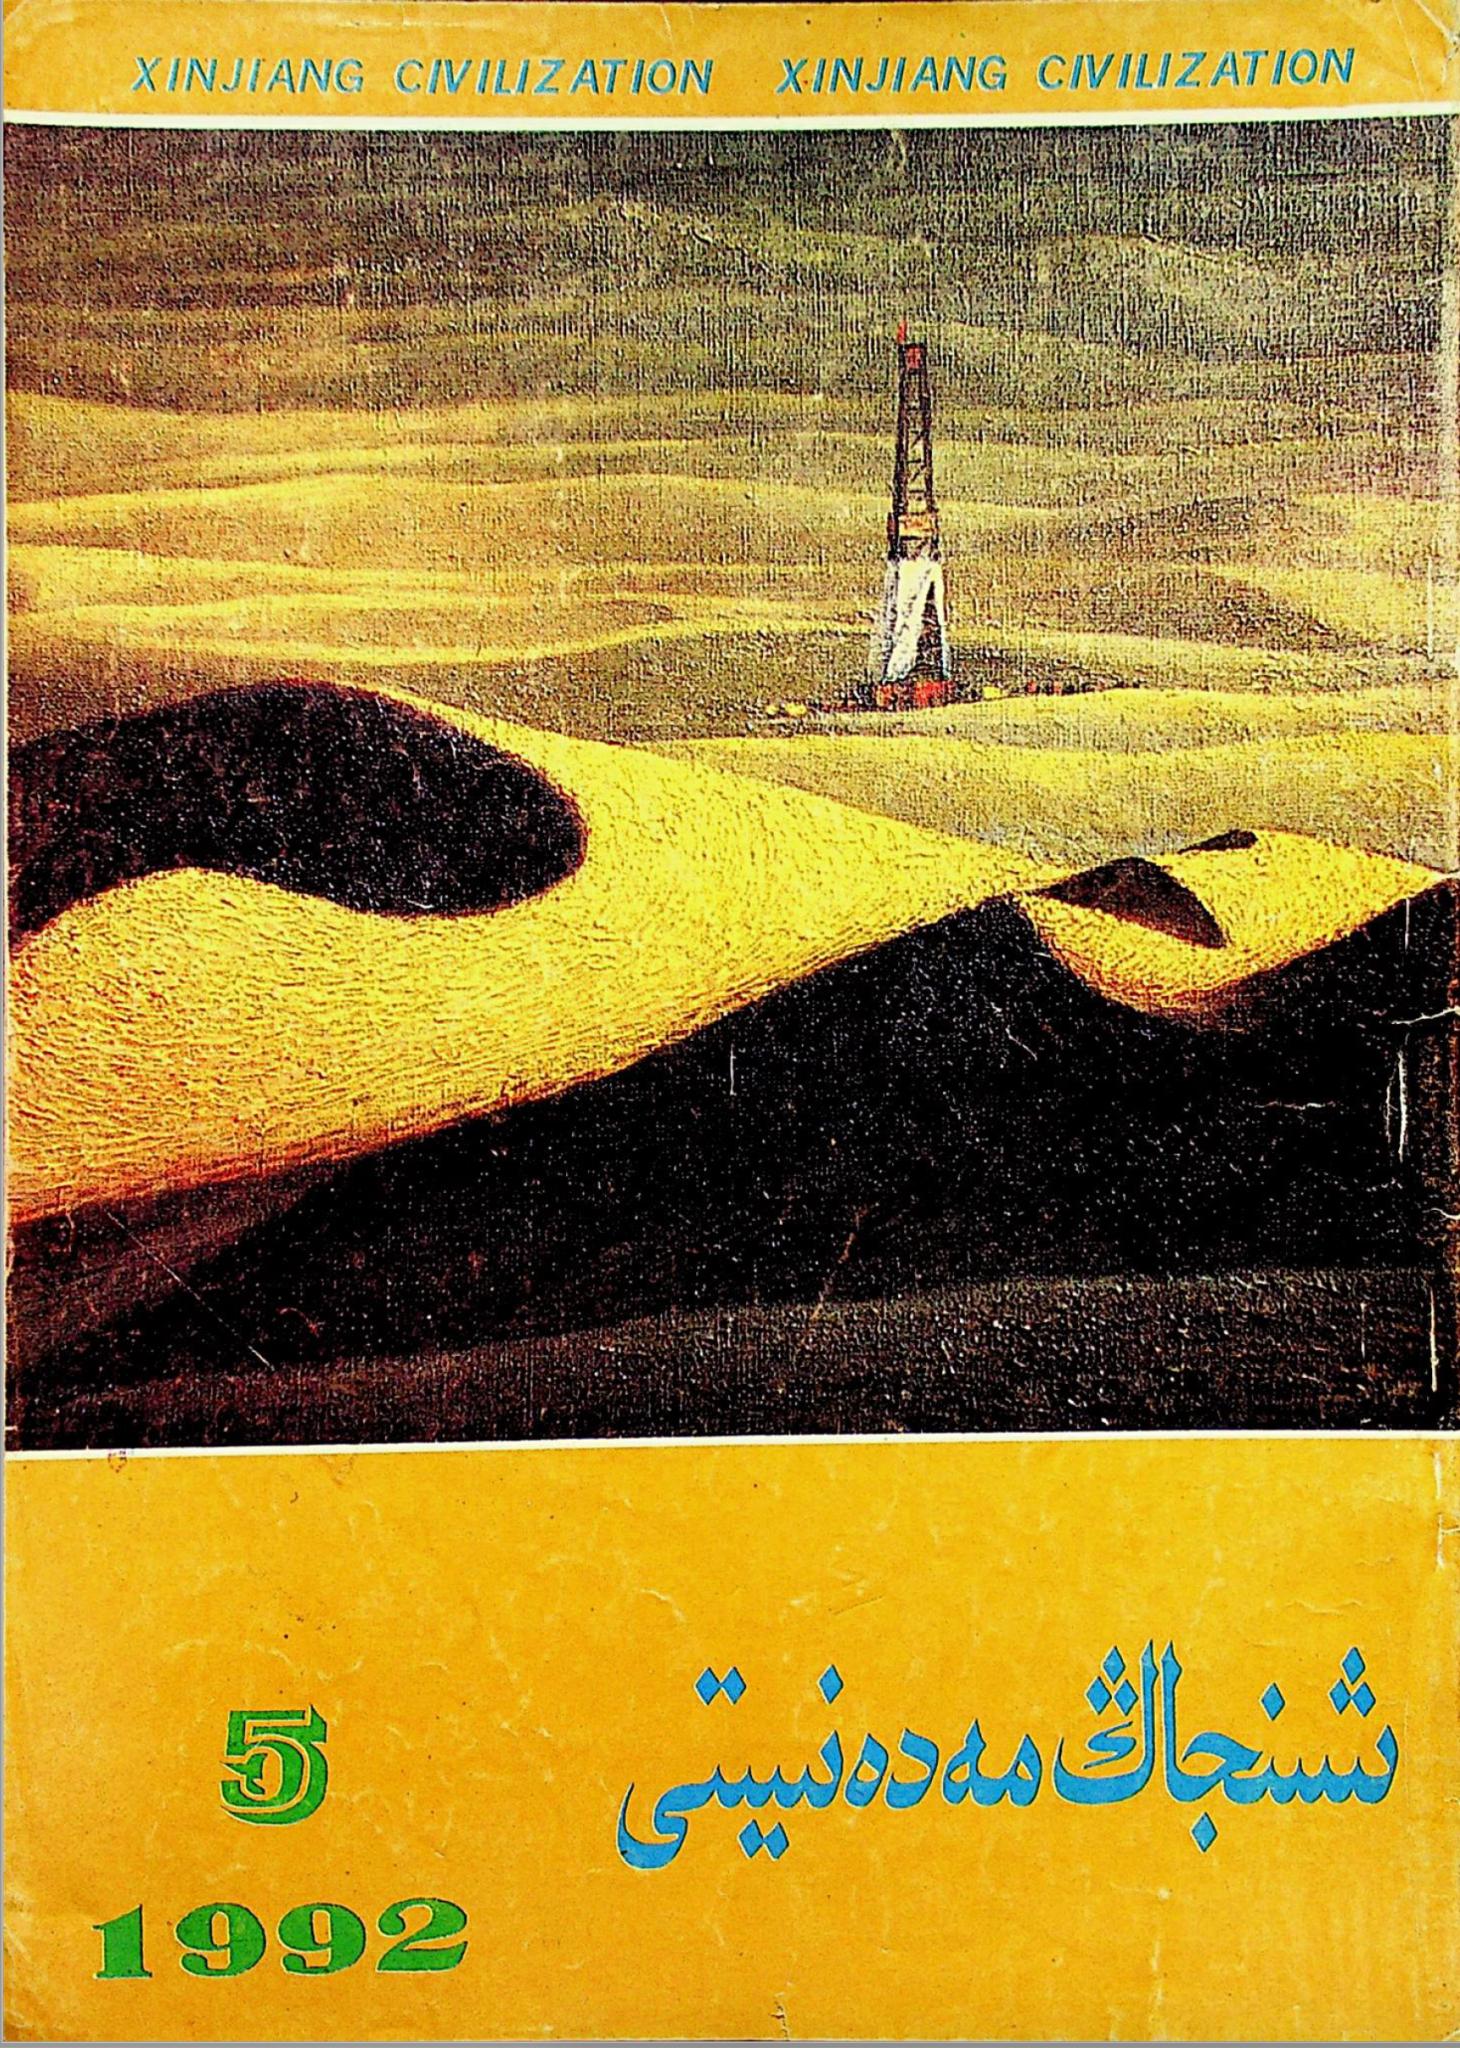 Screenshot 2020 02 22 at 12.19.33 - شىنجاڭ مەدەنىيىتى 1992-يىلى 5 -سان